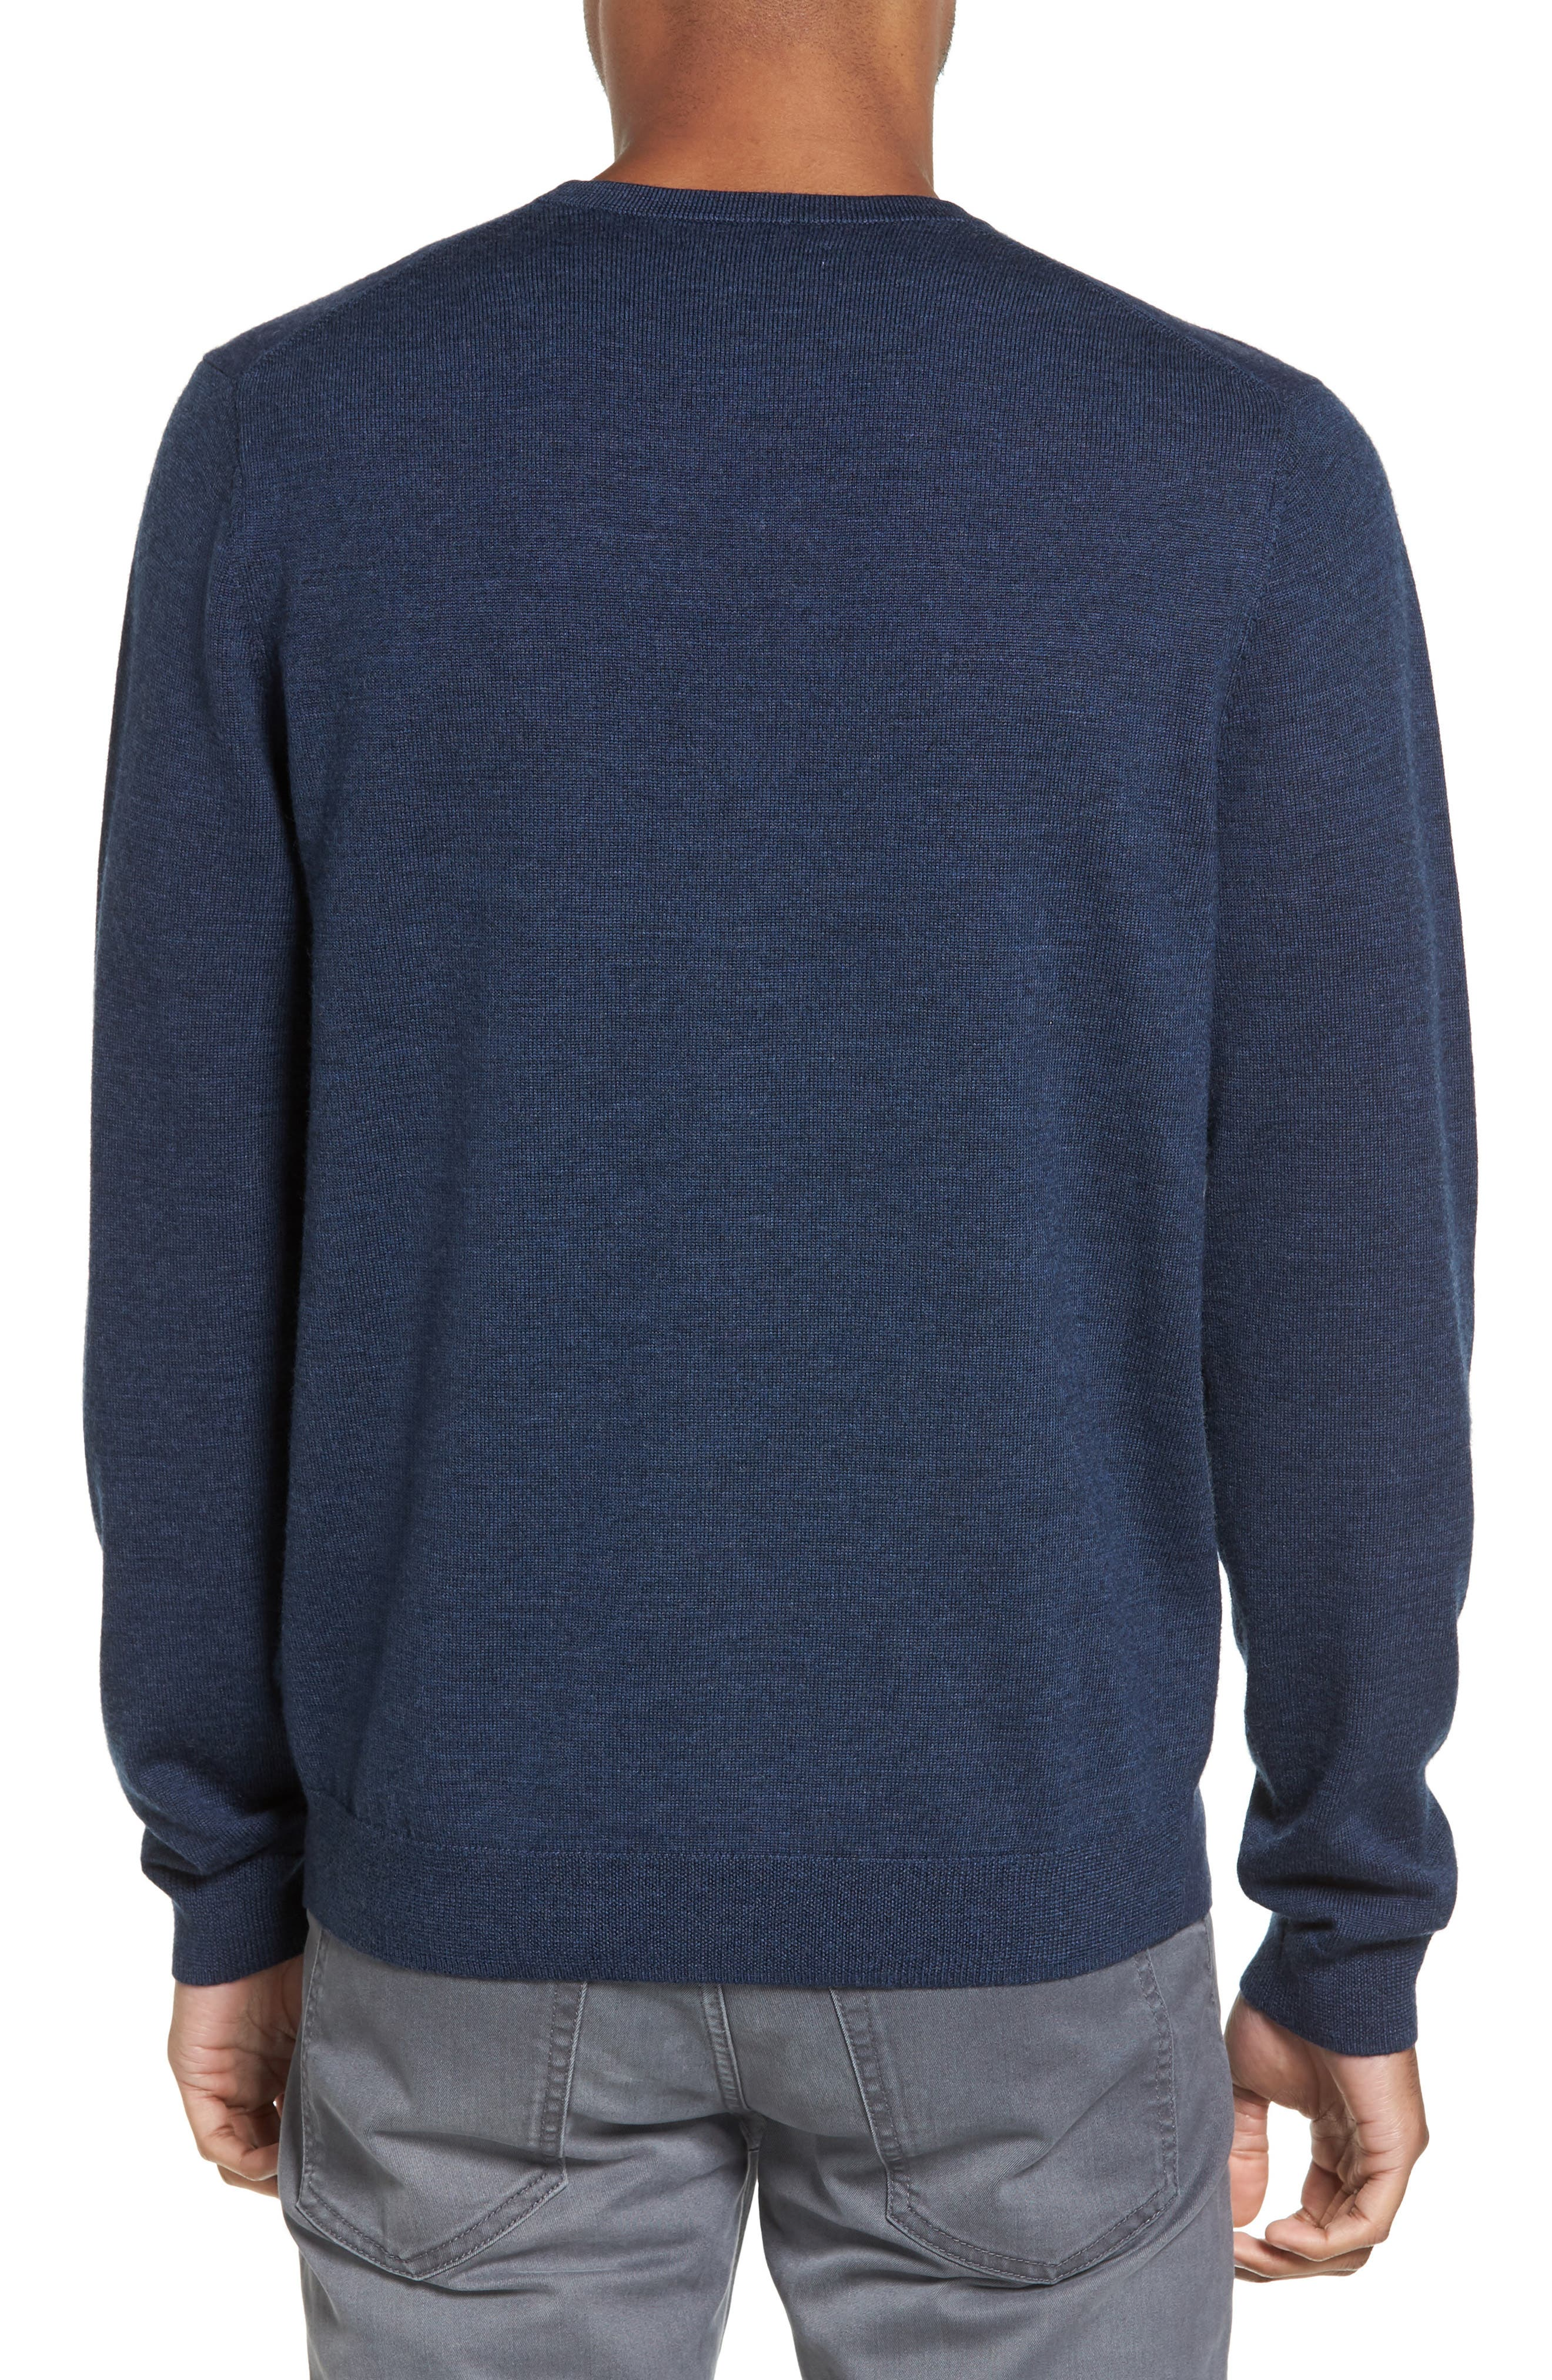 Alternate Image 2  - Calibrate Merino Wool Blend Sweater